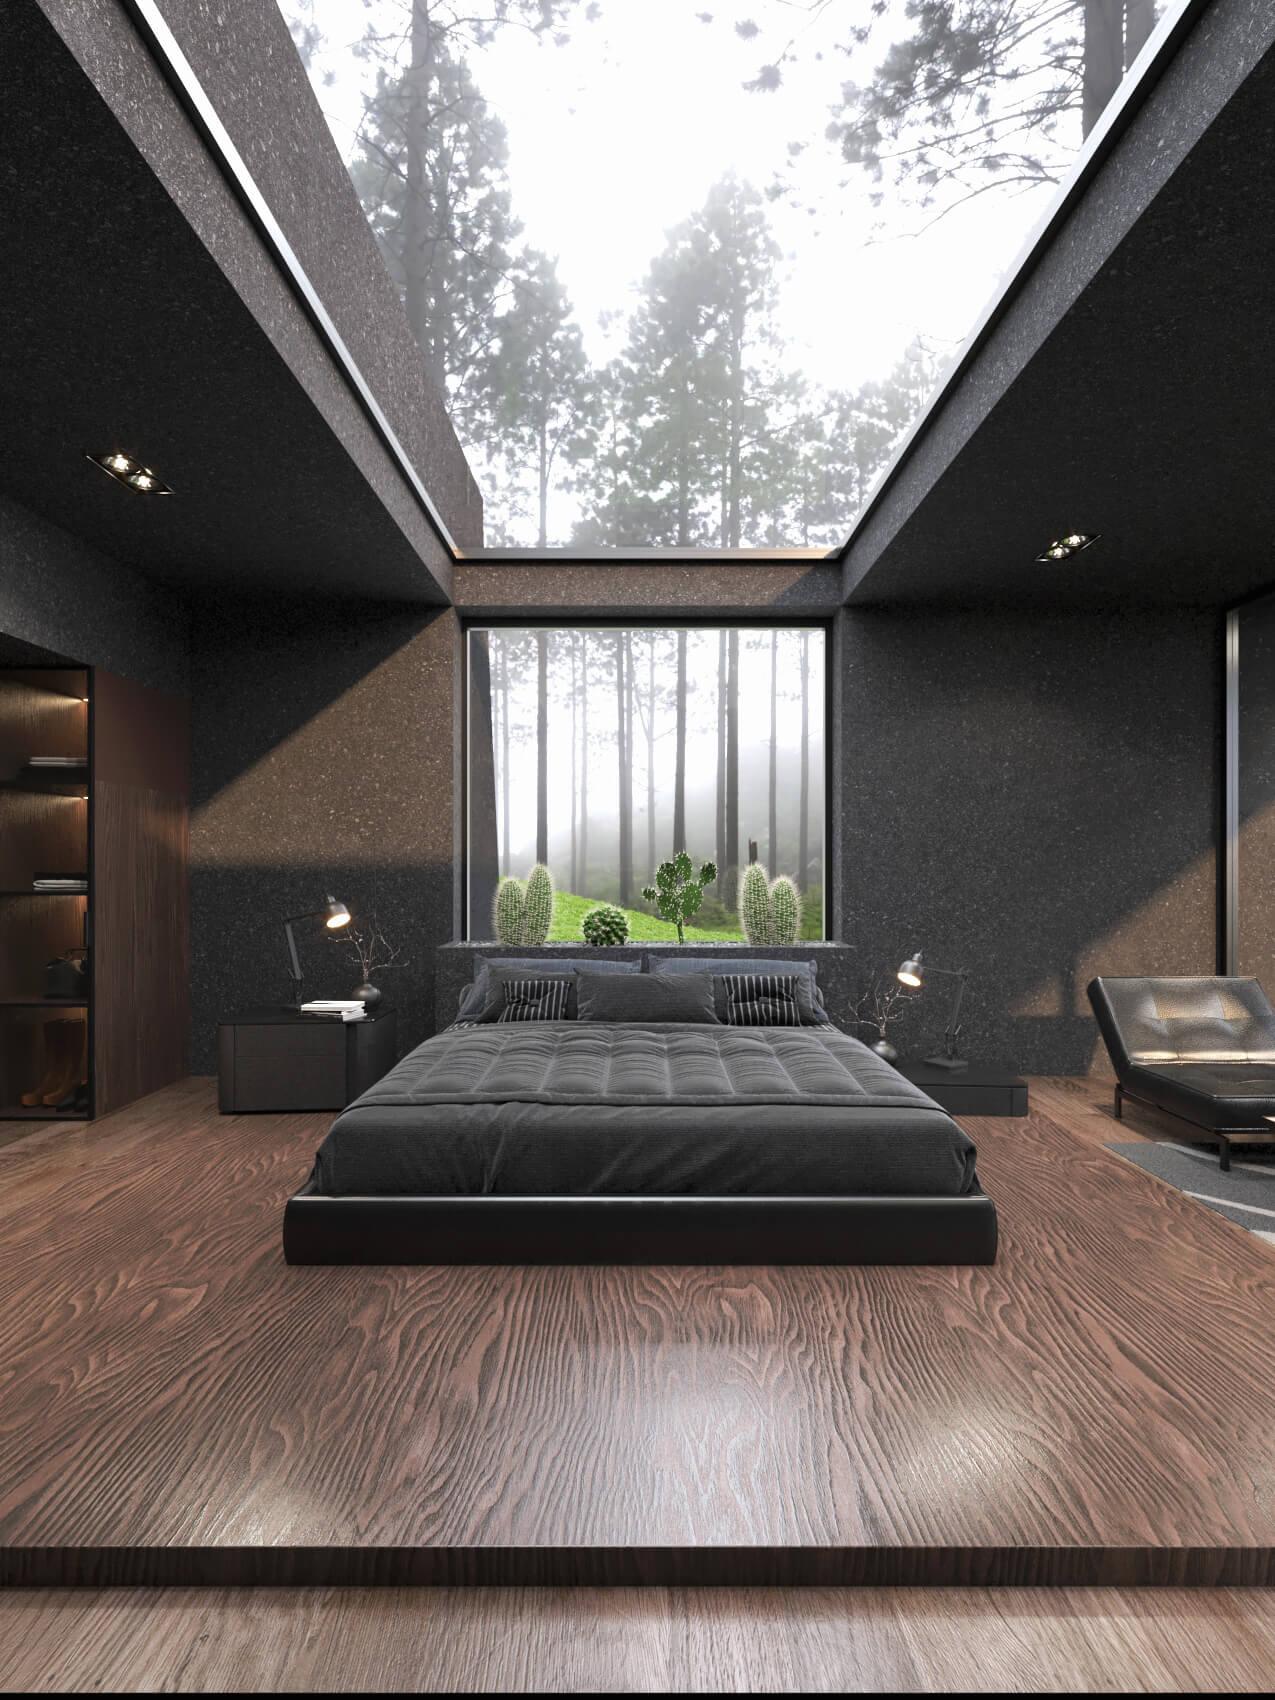 maser bedroom design with skylight